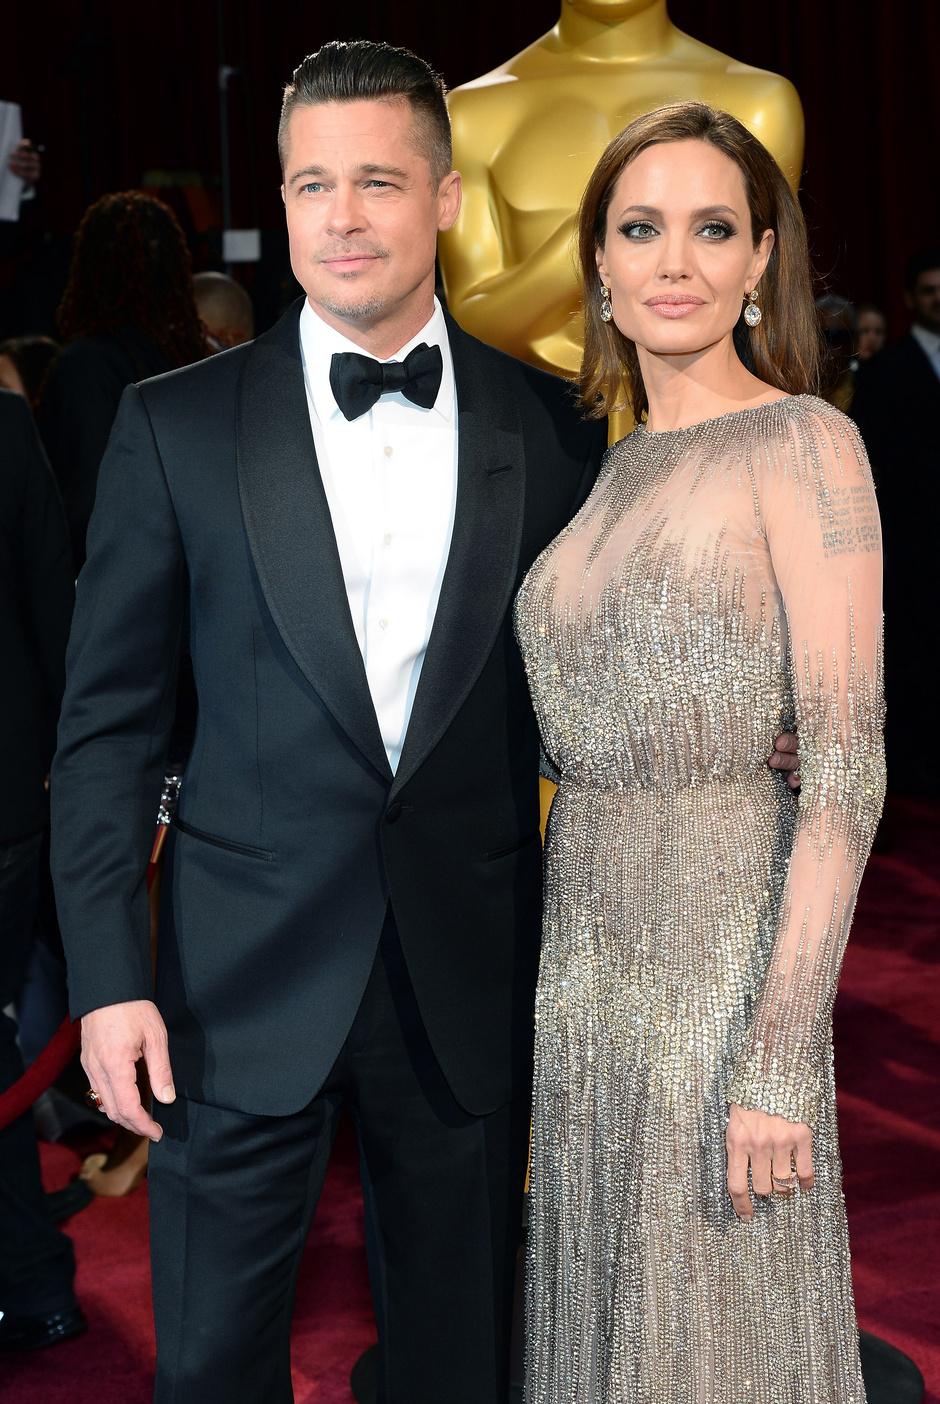 Анджелина Джоли и Брэд Питт на церемонии «Оскар» в 2014 году